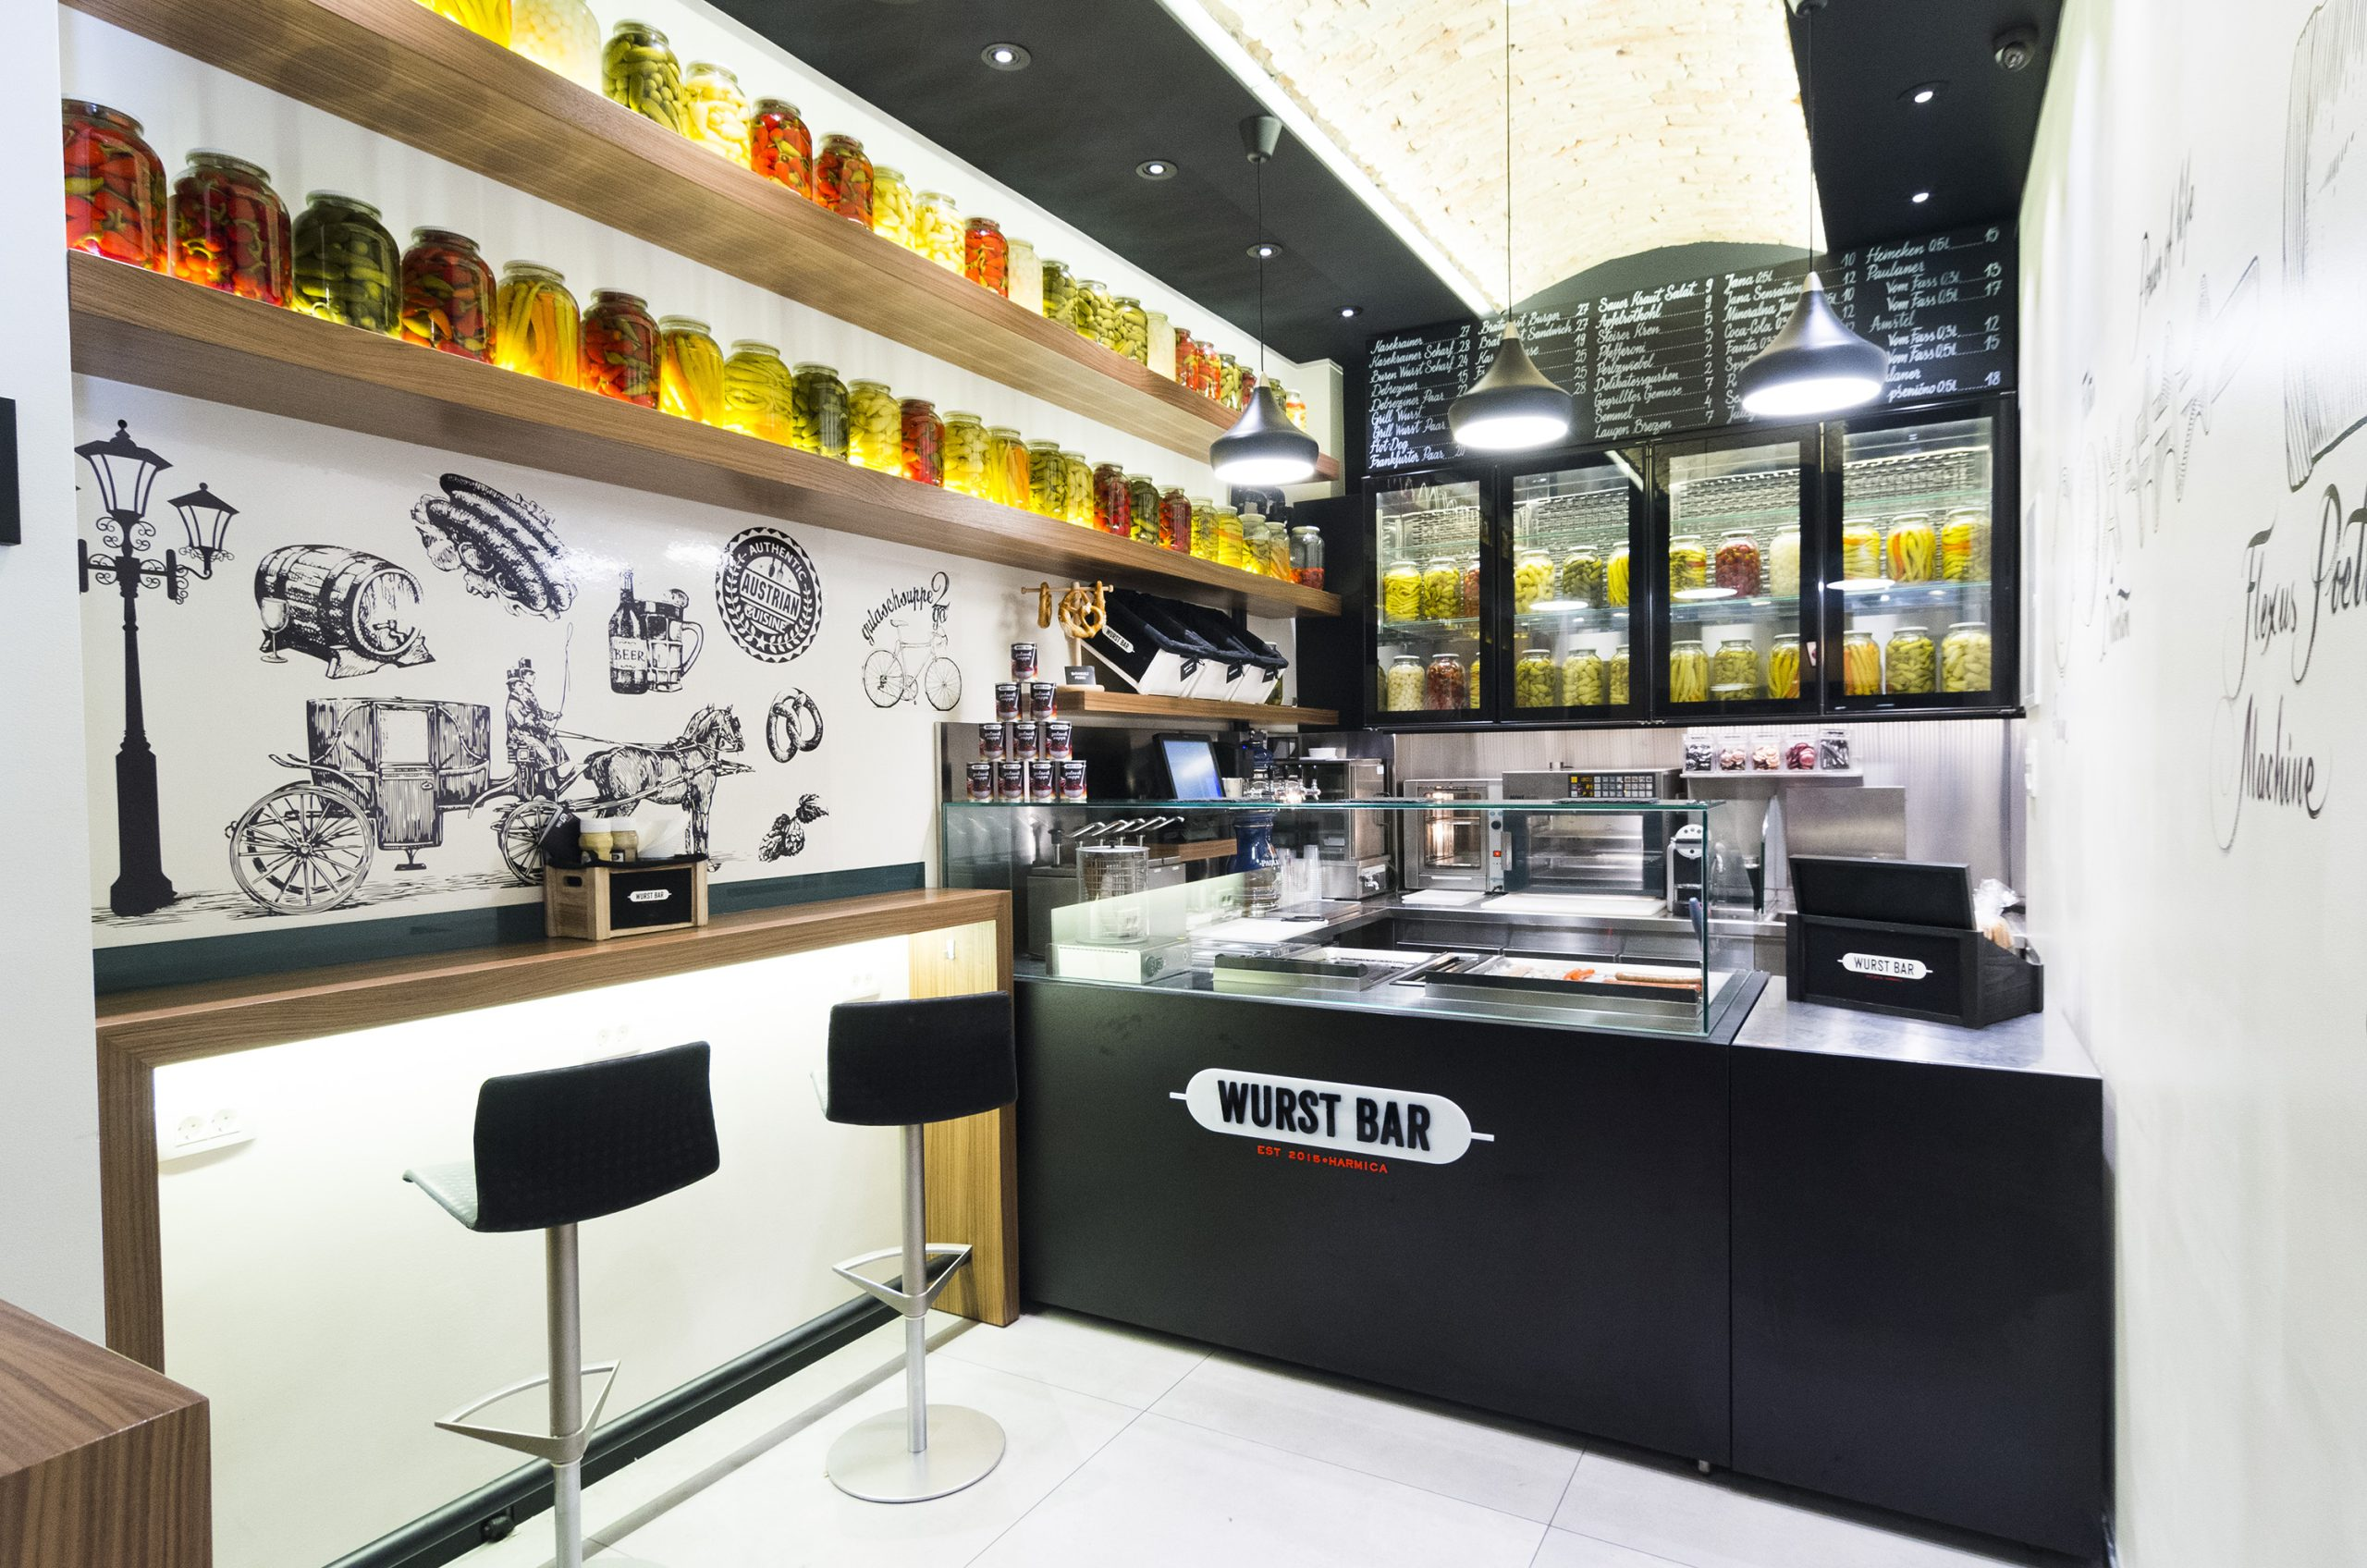 First Original Wurst Bar Opens in Zagreb